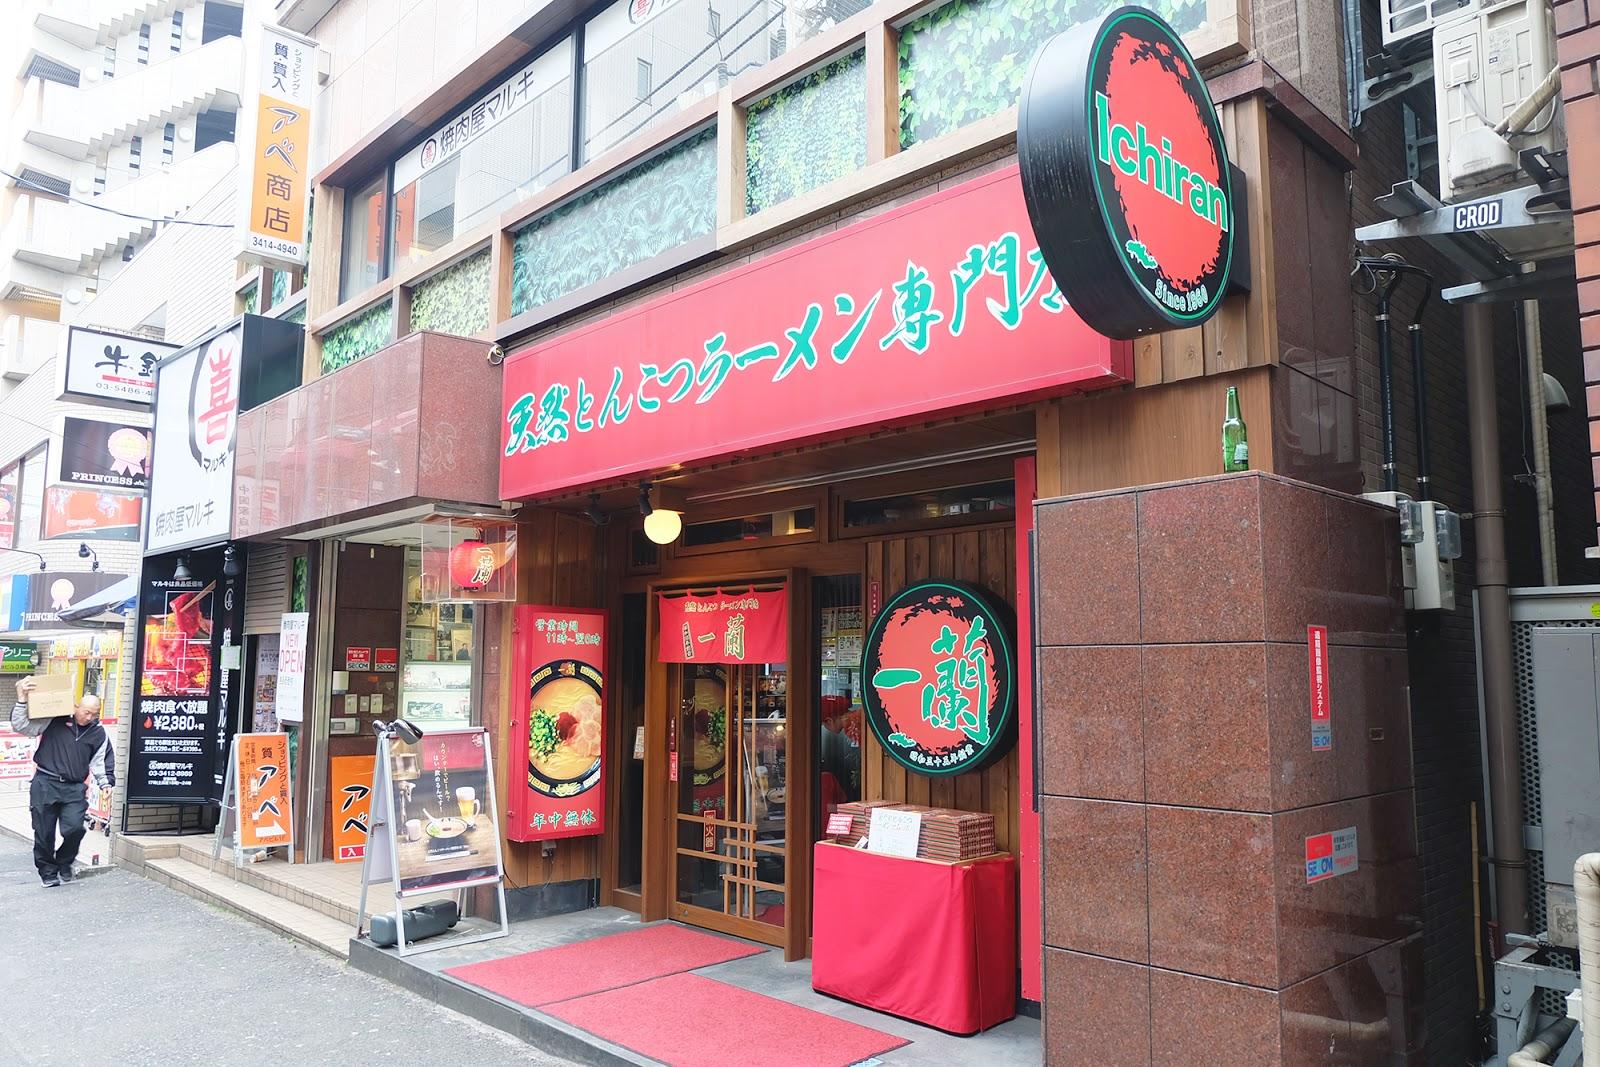 Ichiran Ramen in Shimokitazawa | www.bigdreamerblog.com